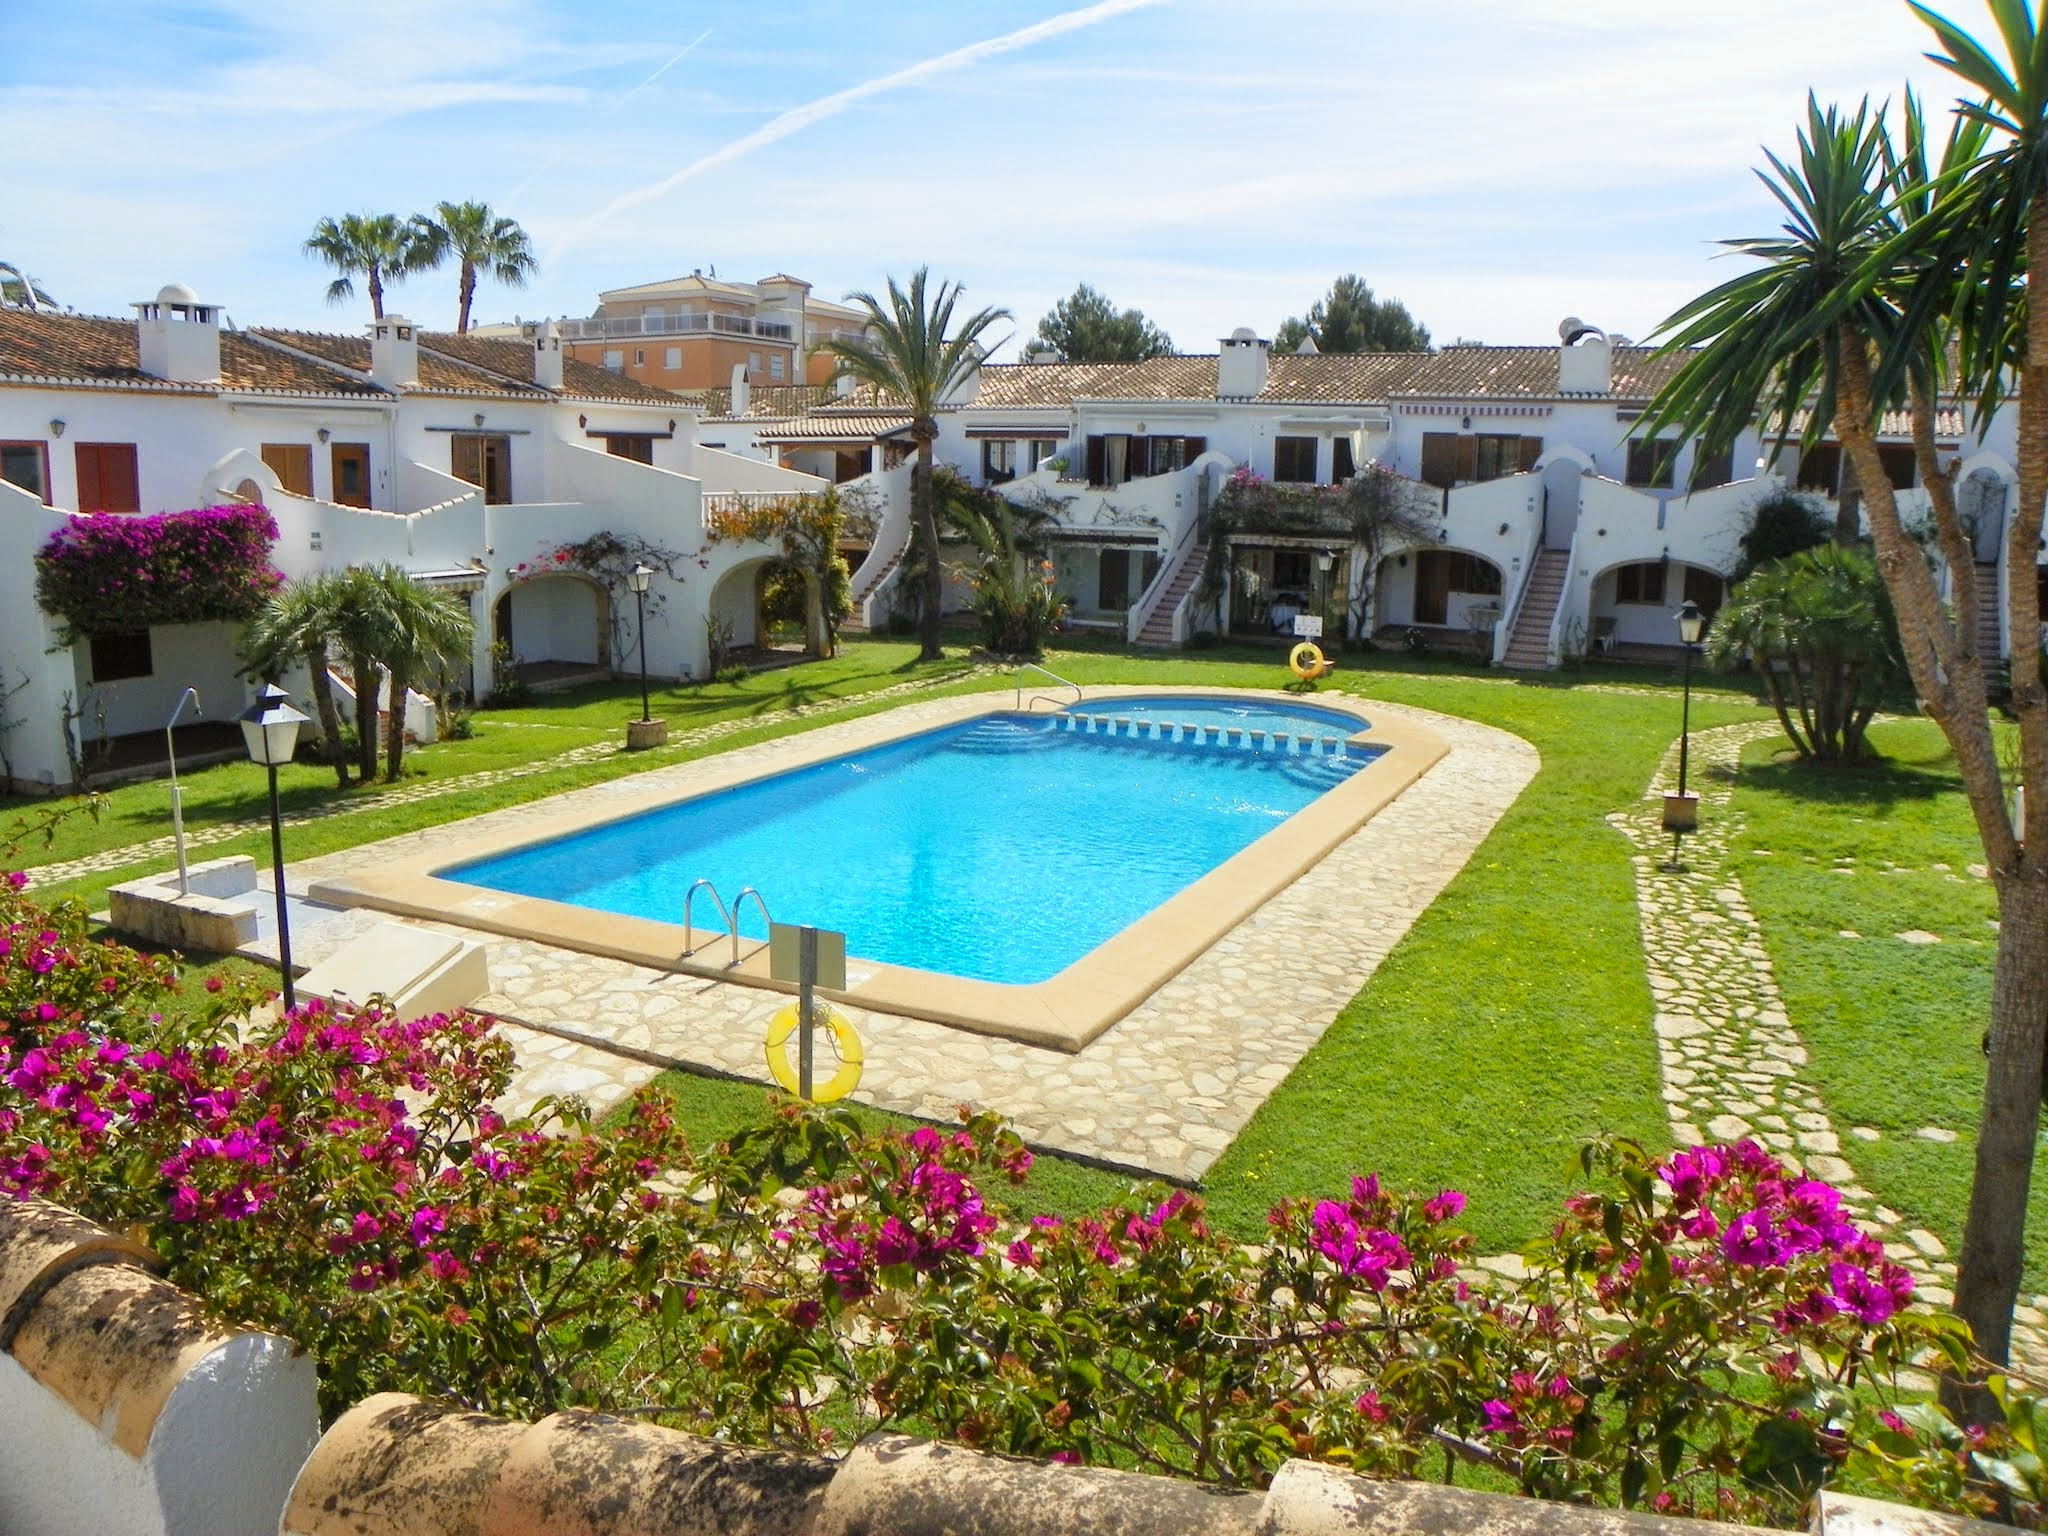 Apartment for sale in Tropicana Park, Las Rotas, Denia – Ref. 001240